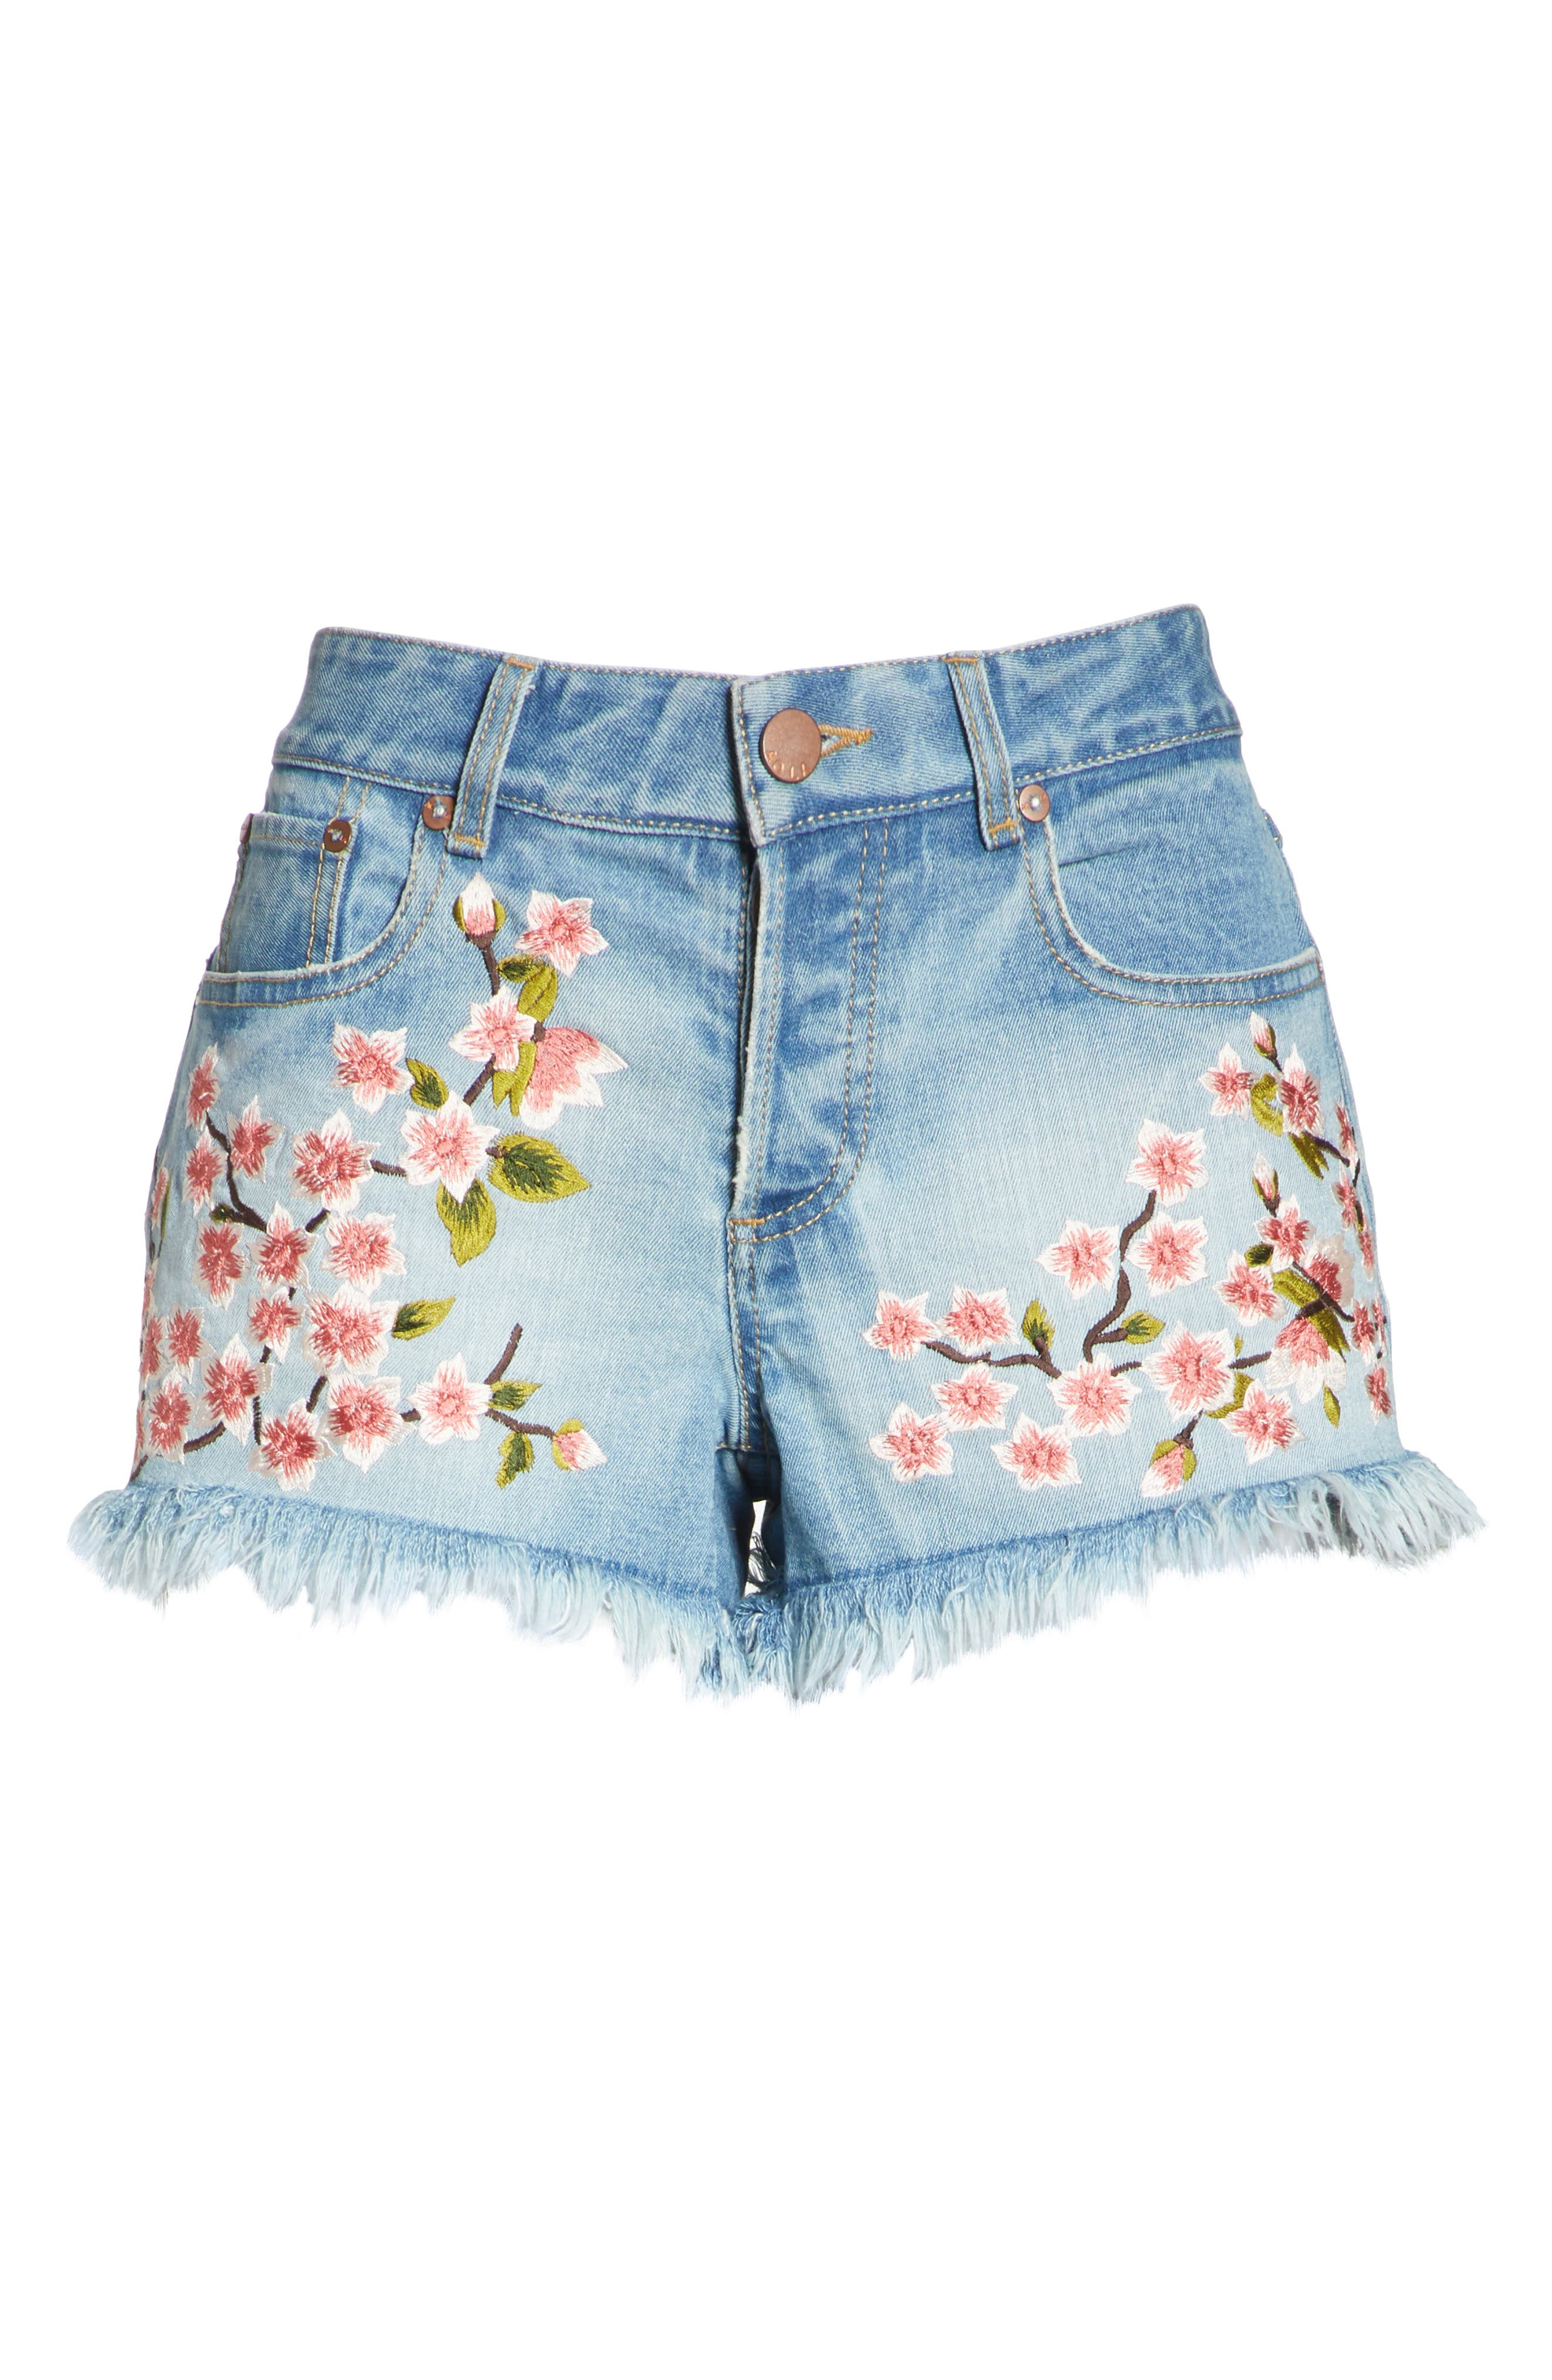 Embroidered Denim Shorts,                             Alternate thumbnail 6, color,                             SWEET EMOTION/ MULTI